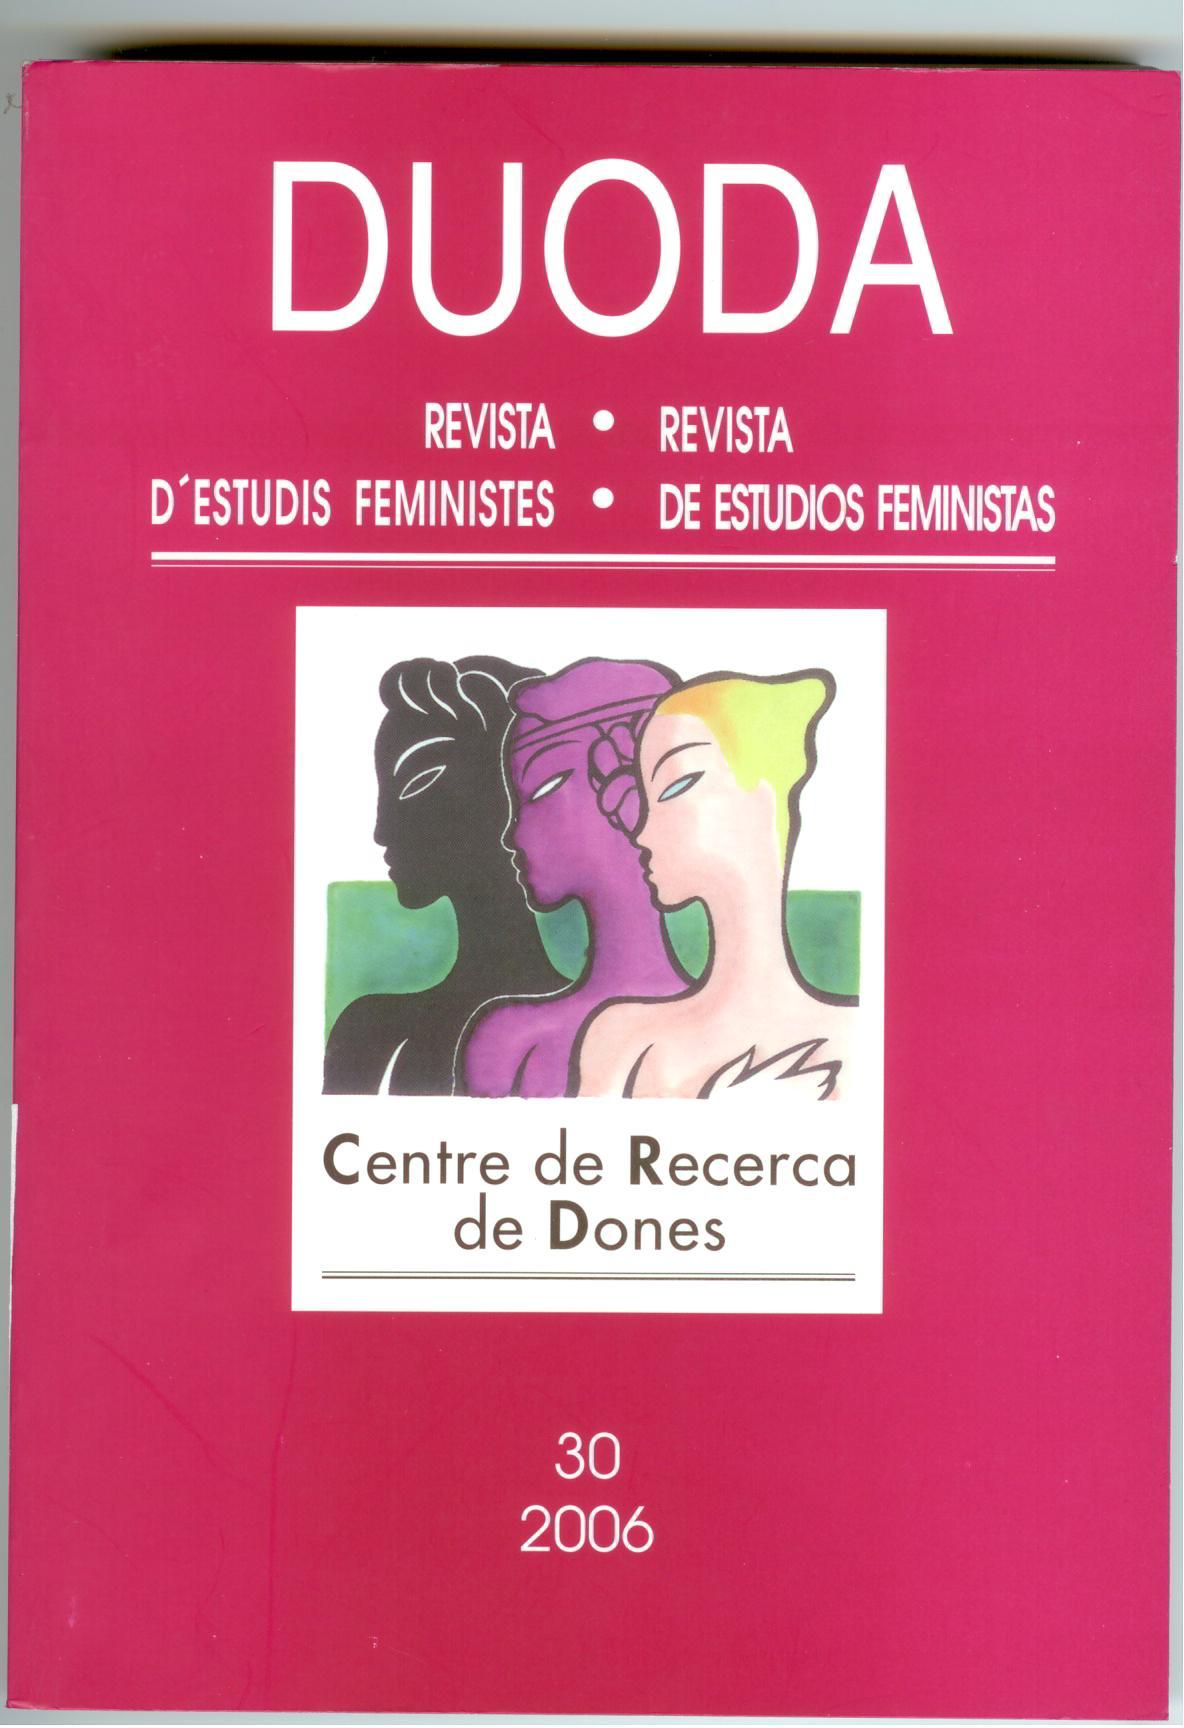 duoda-2006.jpg